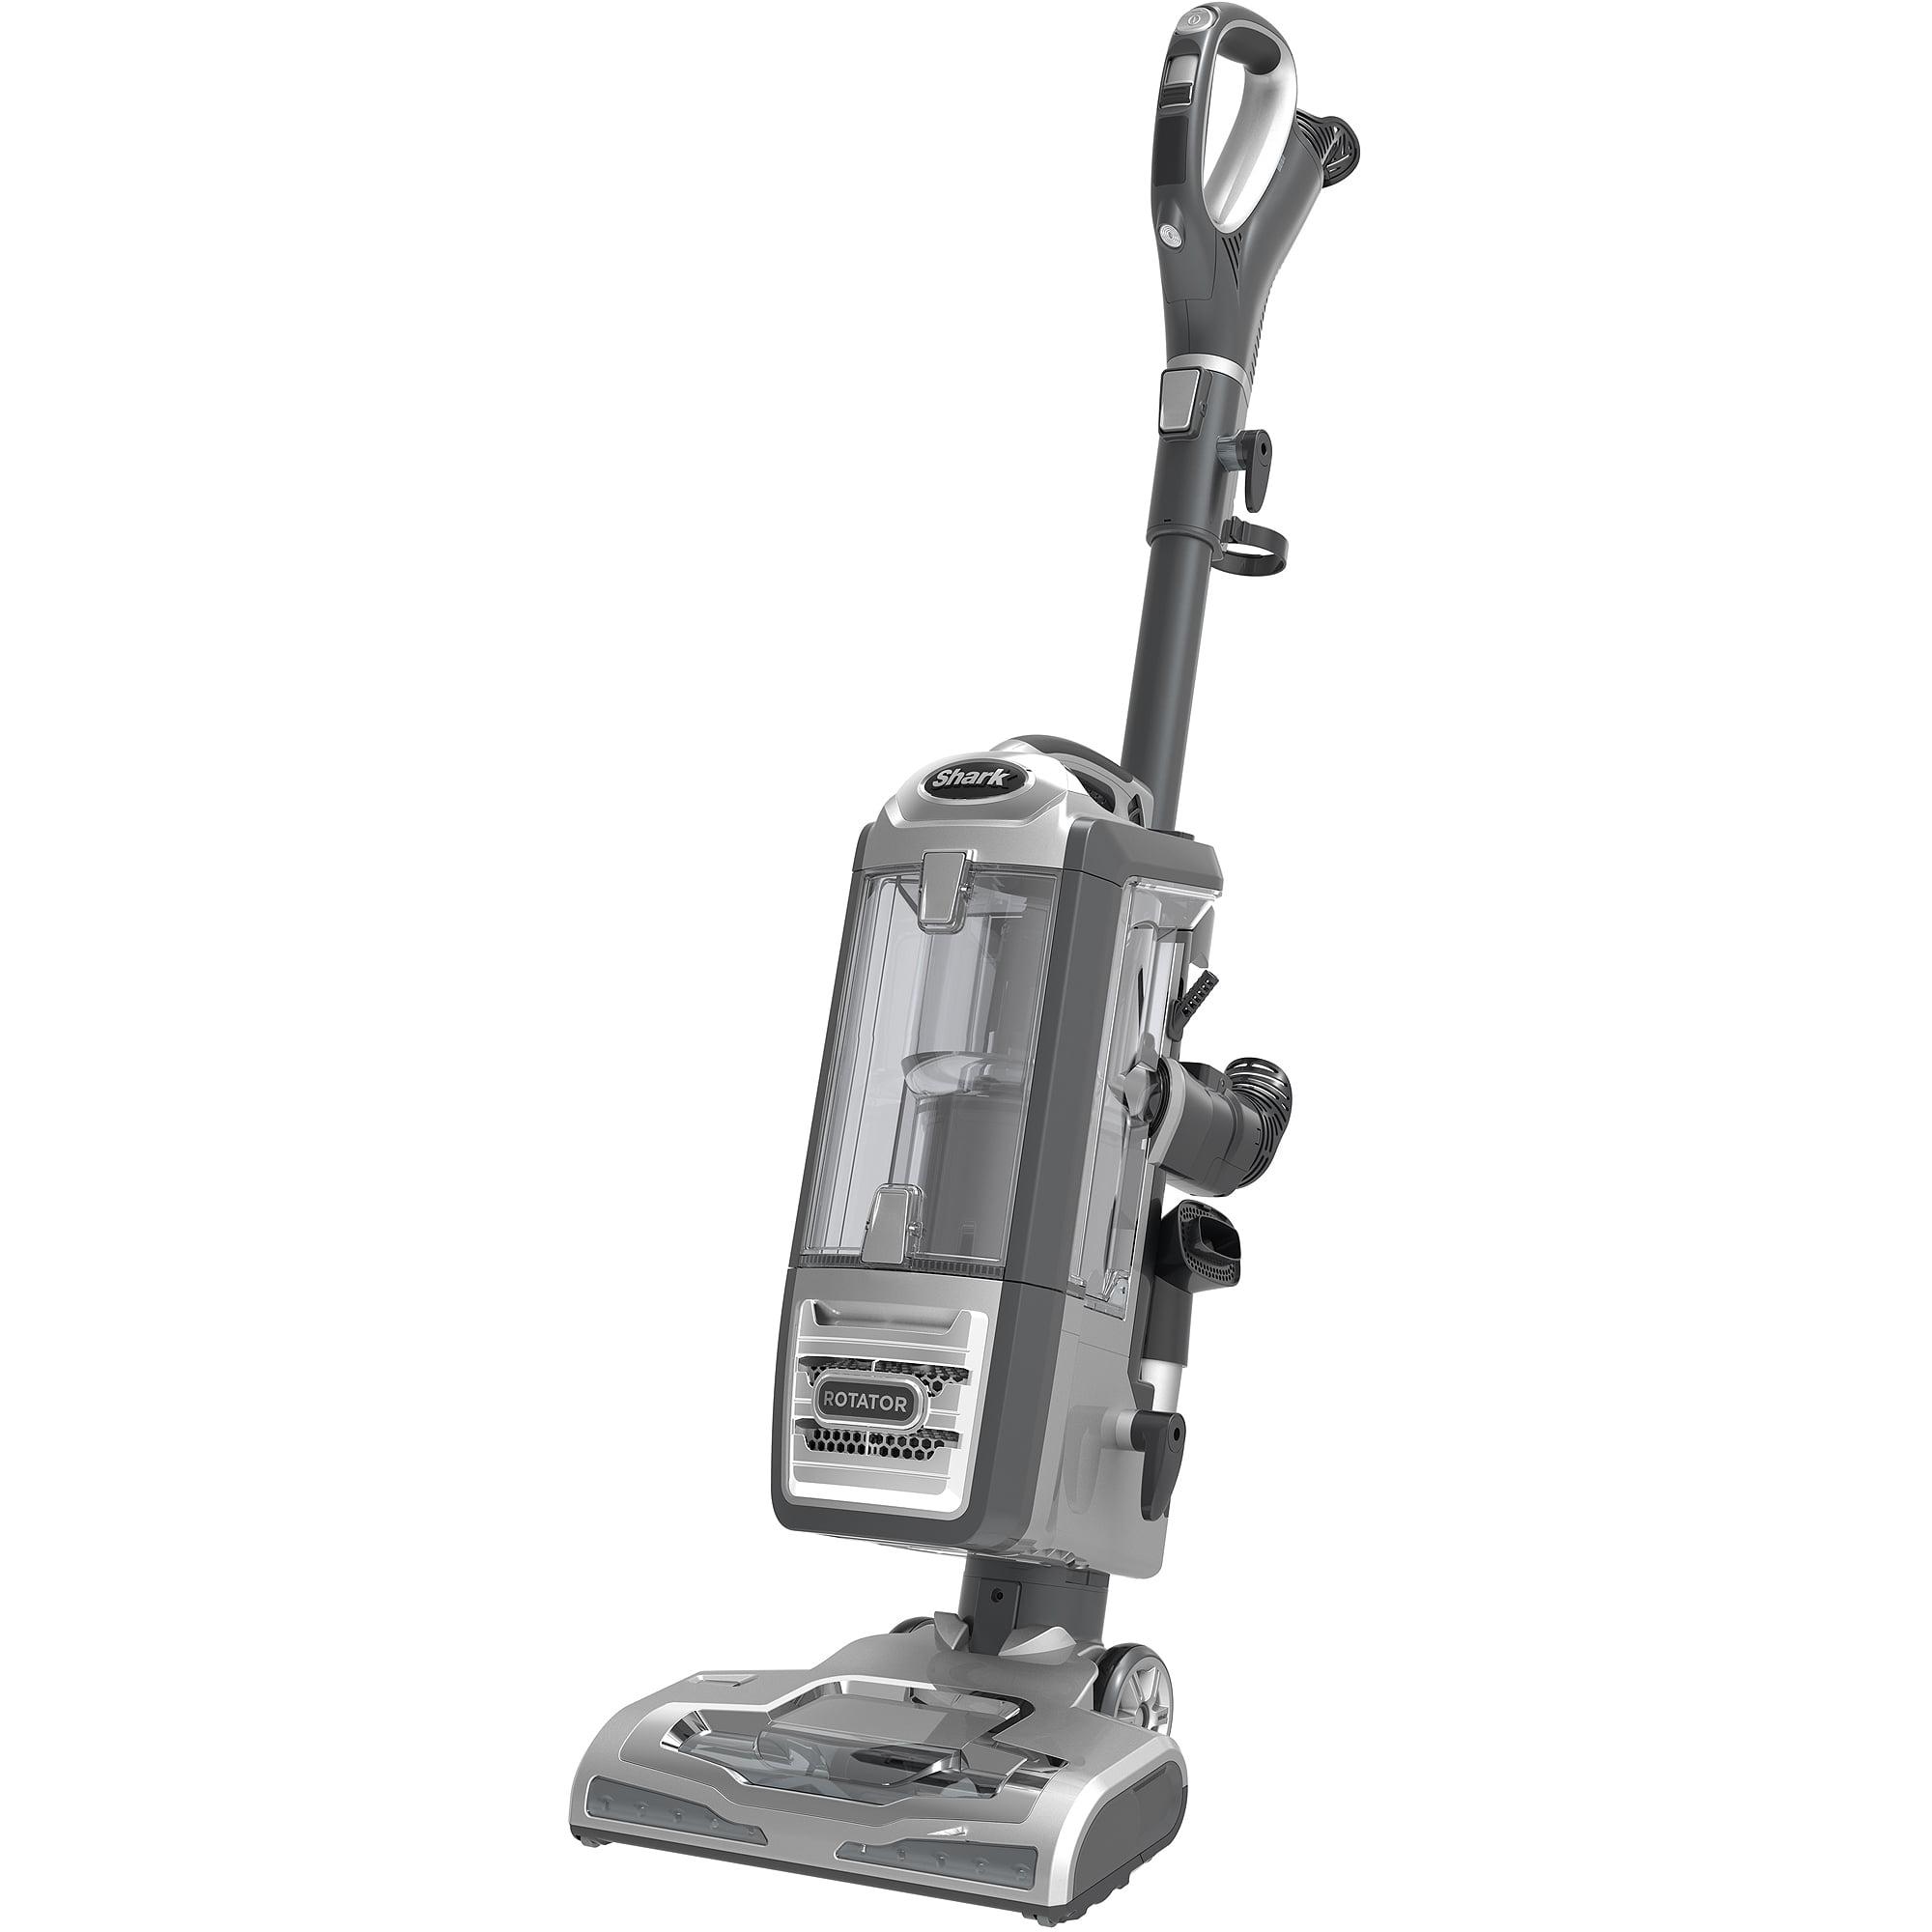 Shark Rotator Powered Lift Away Upright Vacuum Cleaner